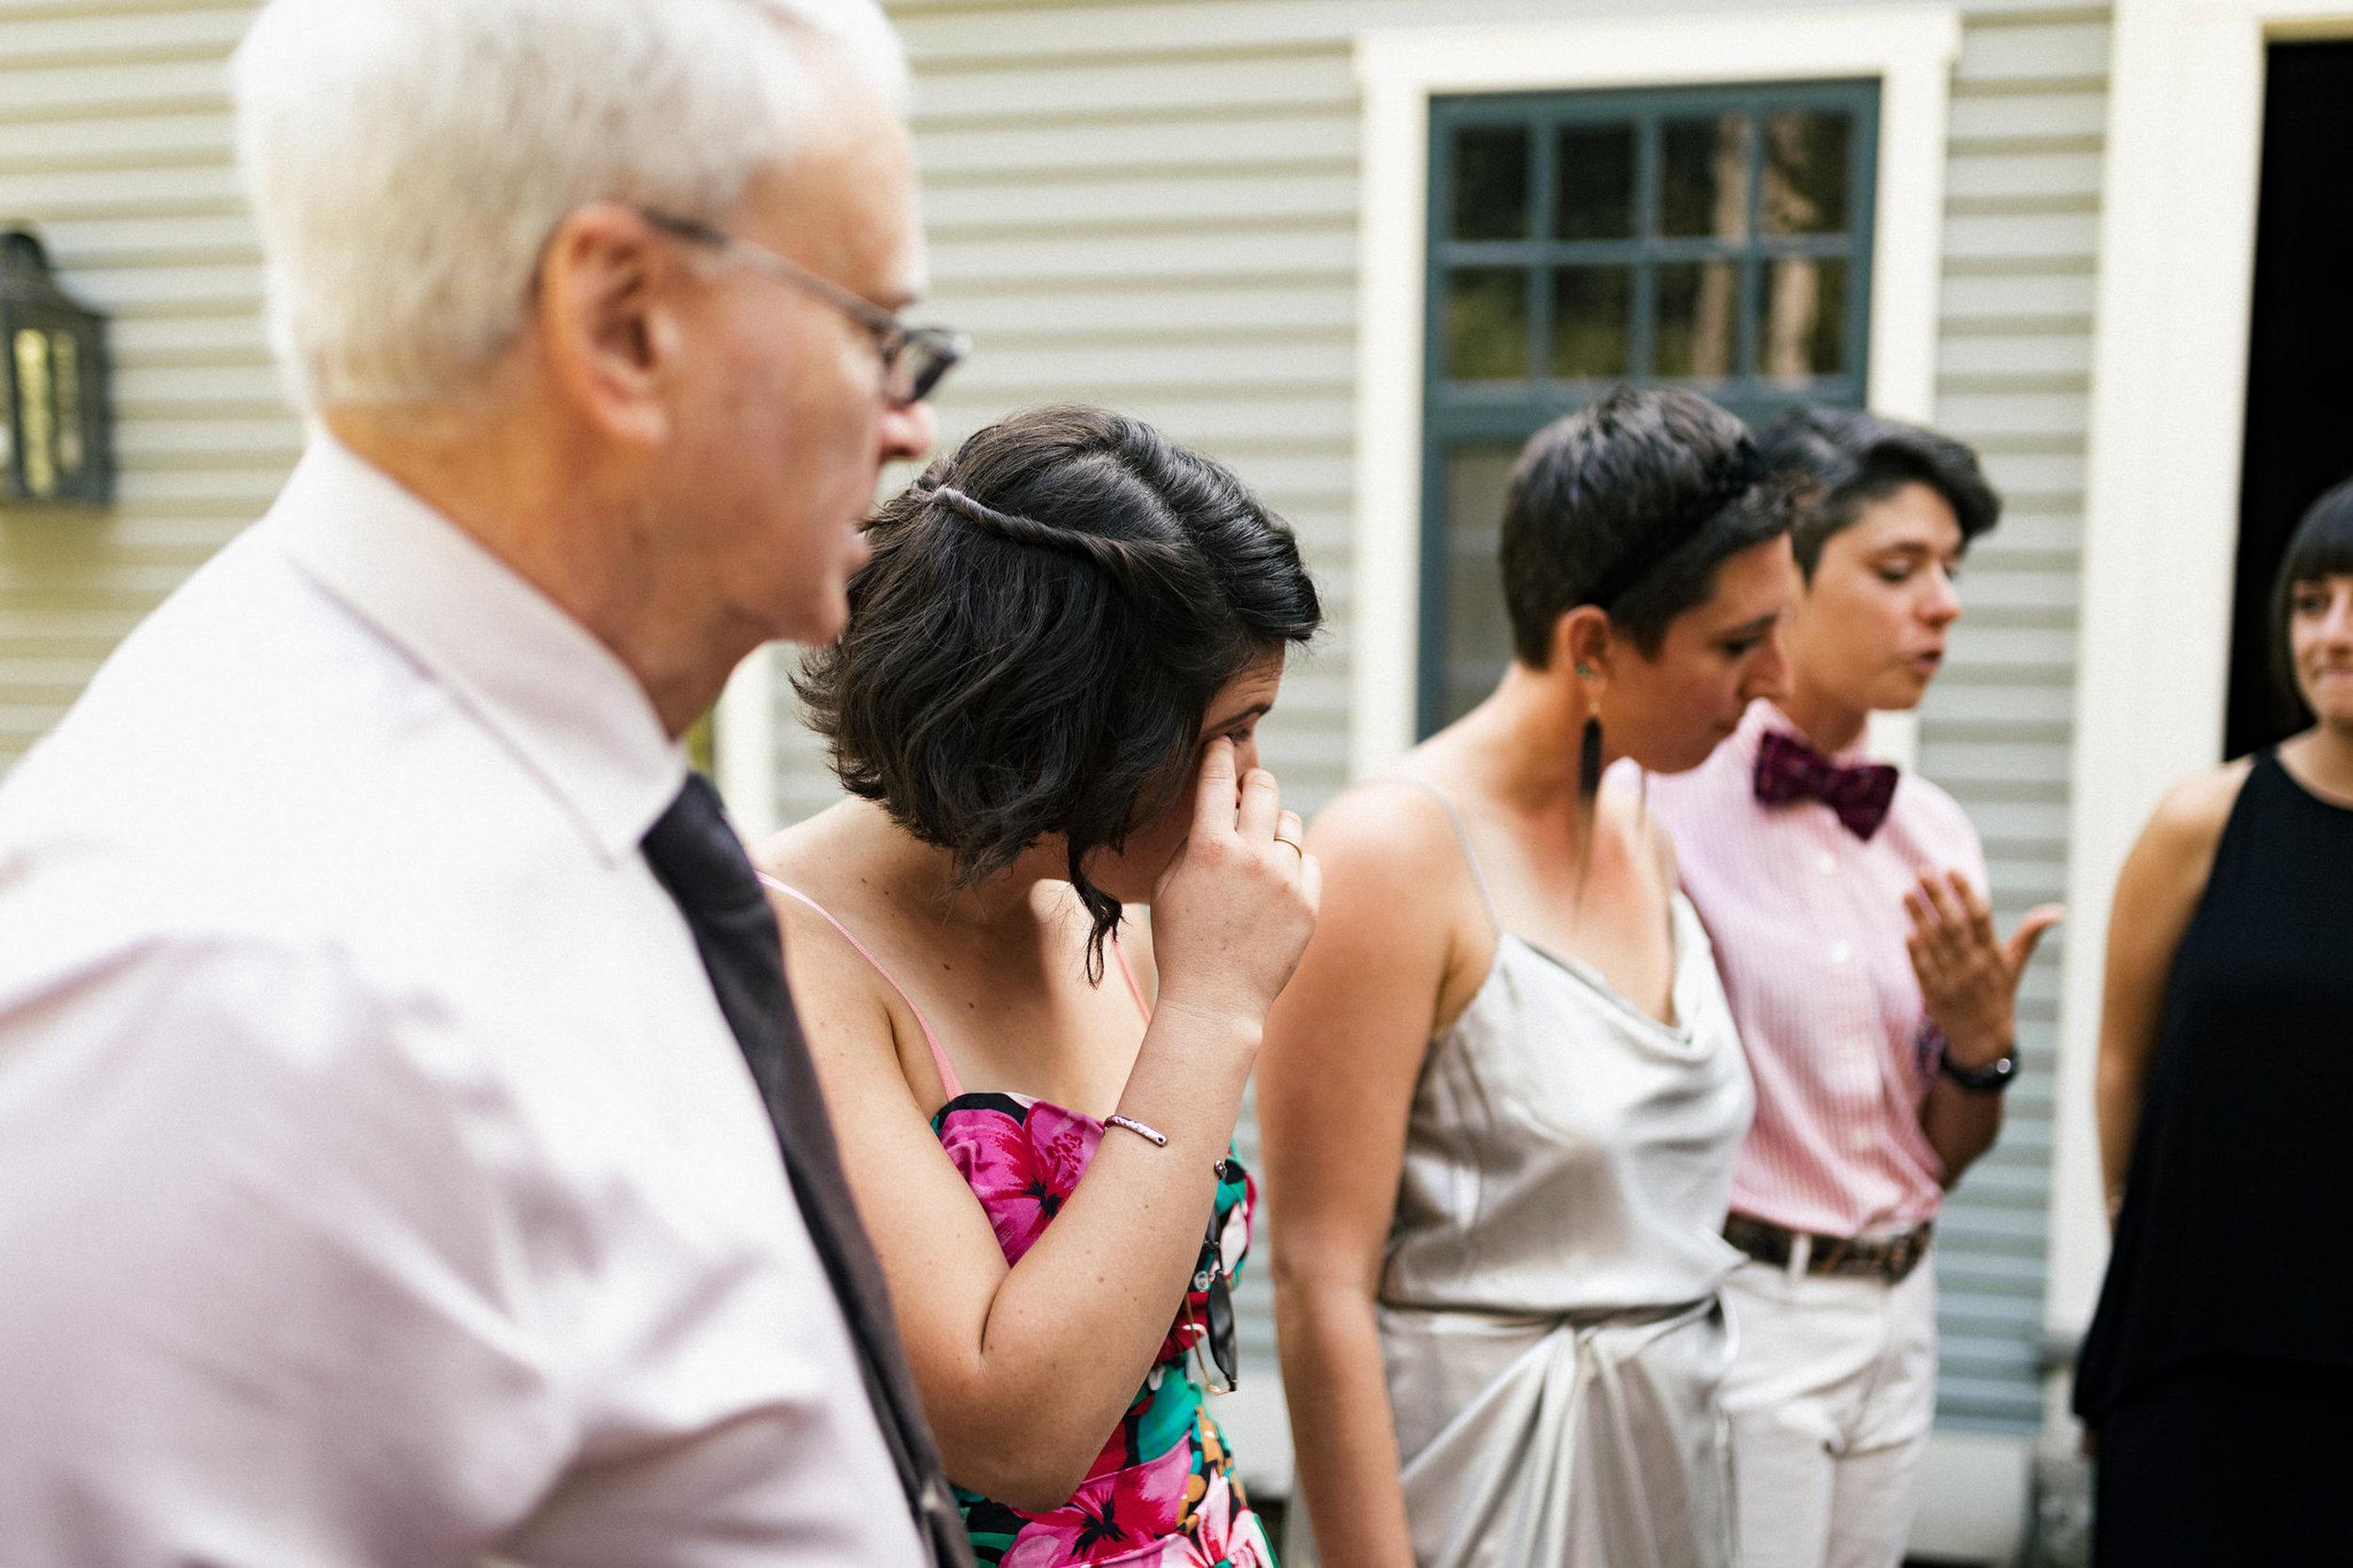 boston_wedding_photographer-28.jpg